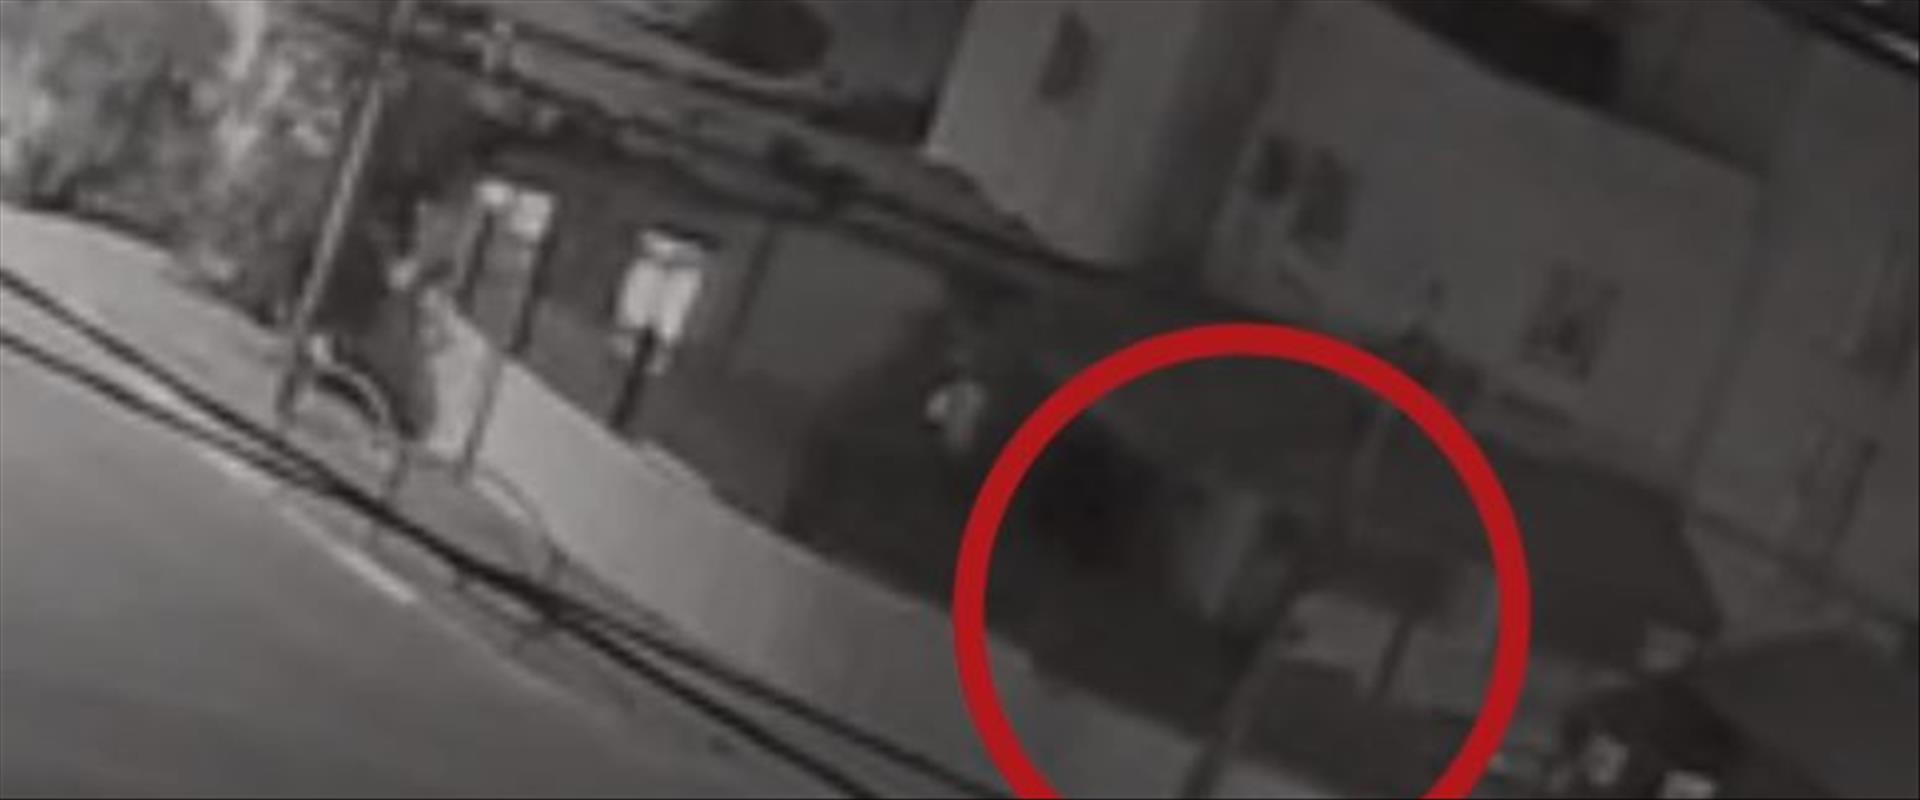 תיעוד אירוע הירי בנג'אח אבו עראר בערערה בנגב